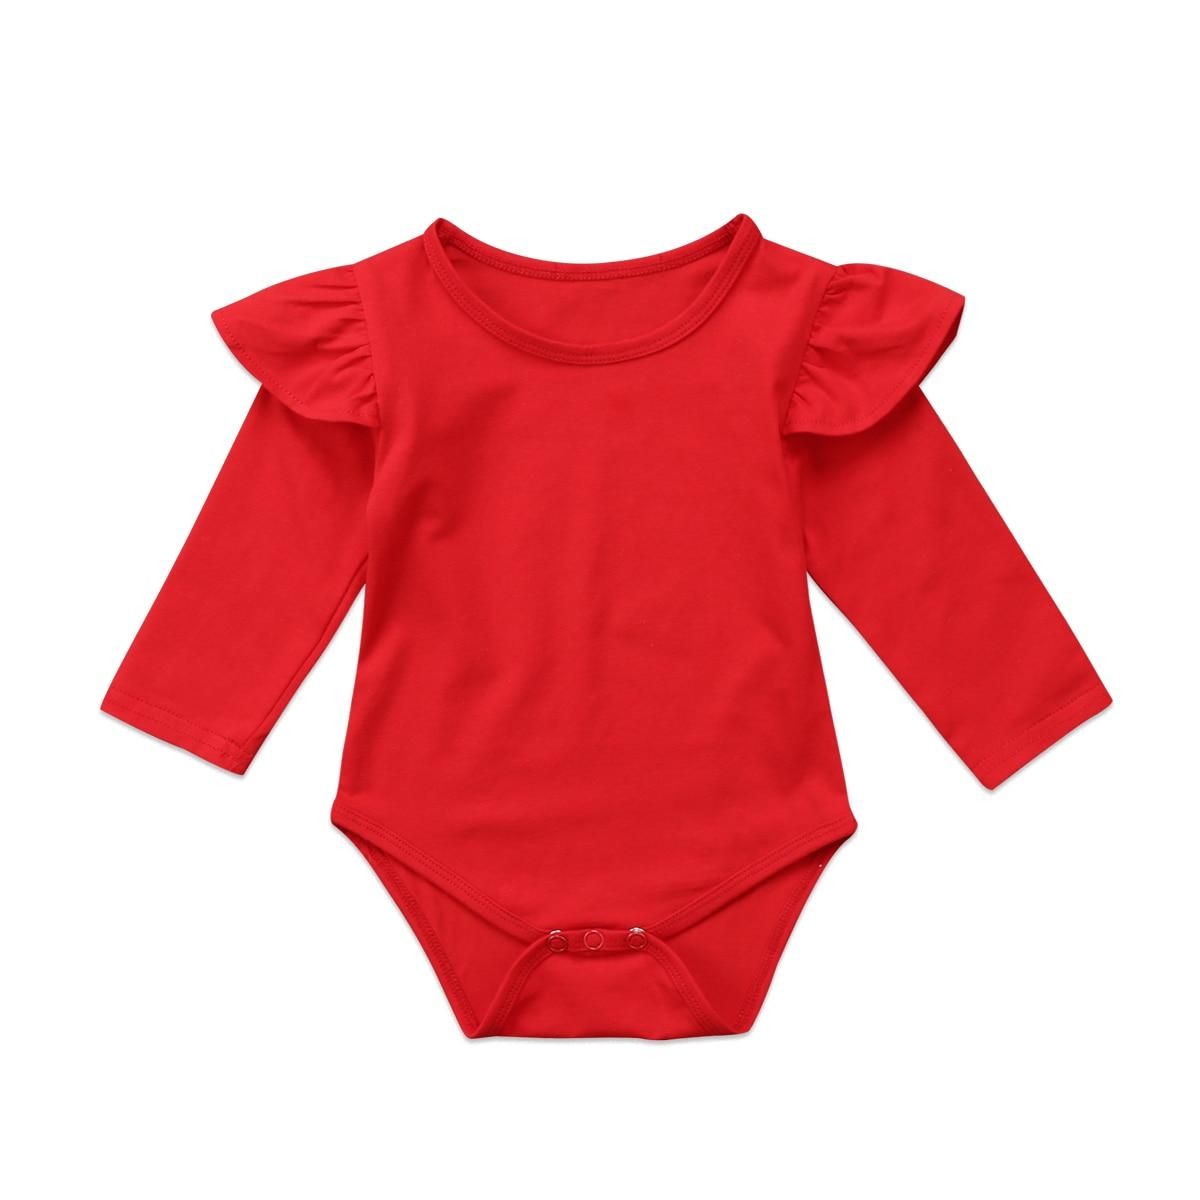 One Piece Newborn Kid Baby Girls 2017 New Christmas Ruffle Long Sleeve Solid Red